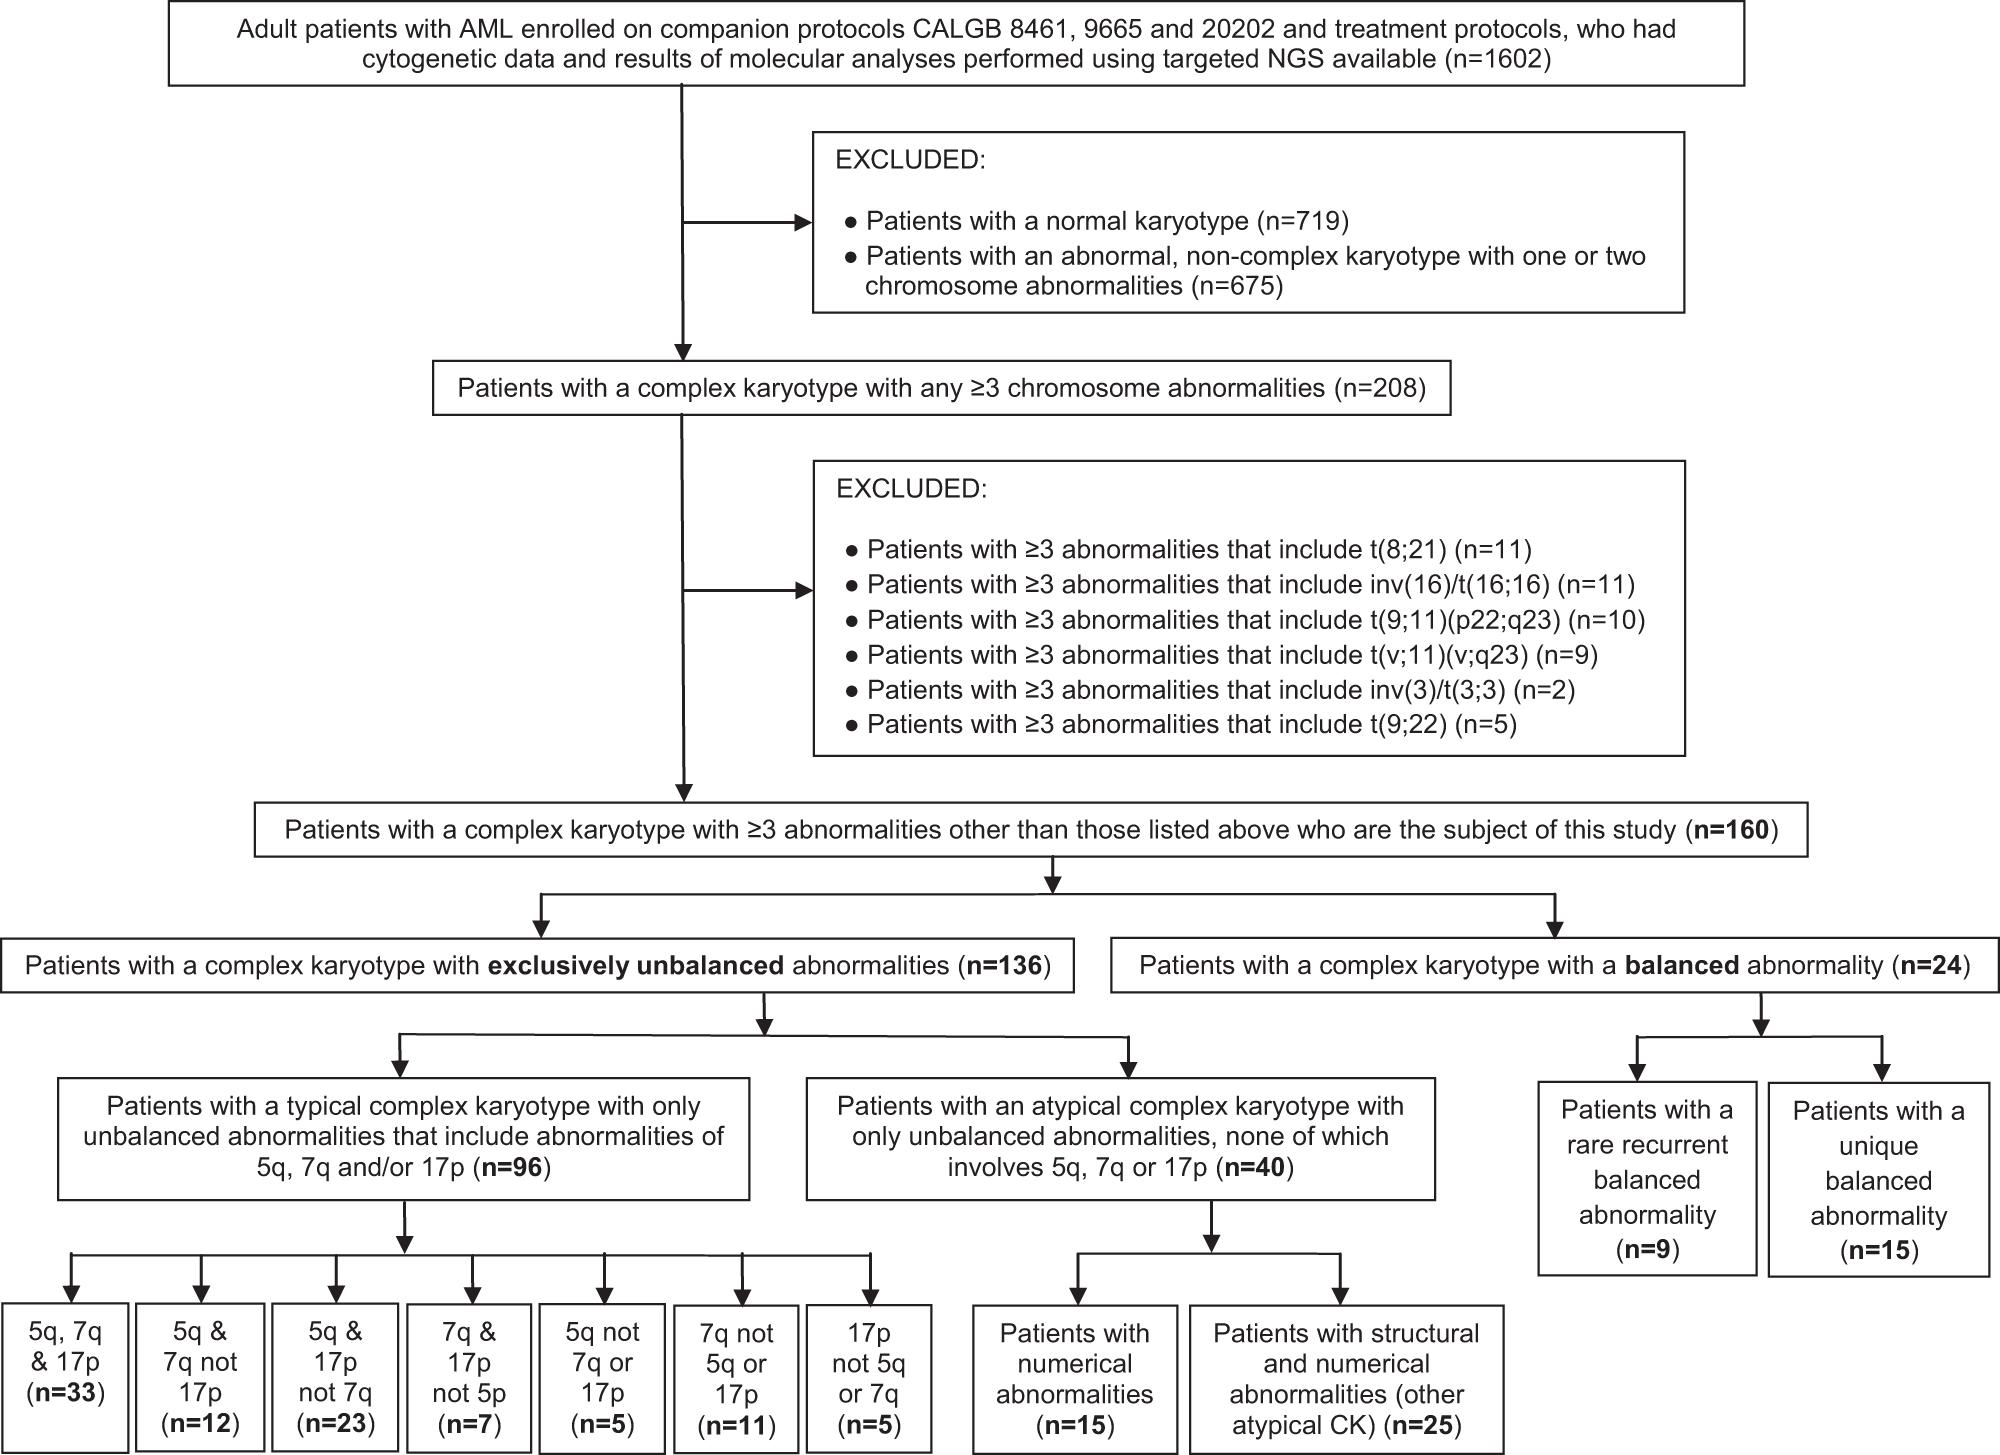 Complex karyotype in de novo acute myeloid leukemia: typical